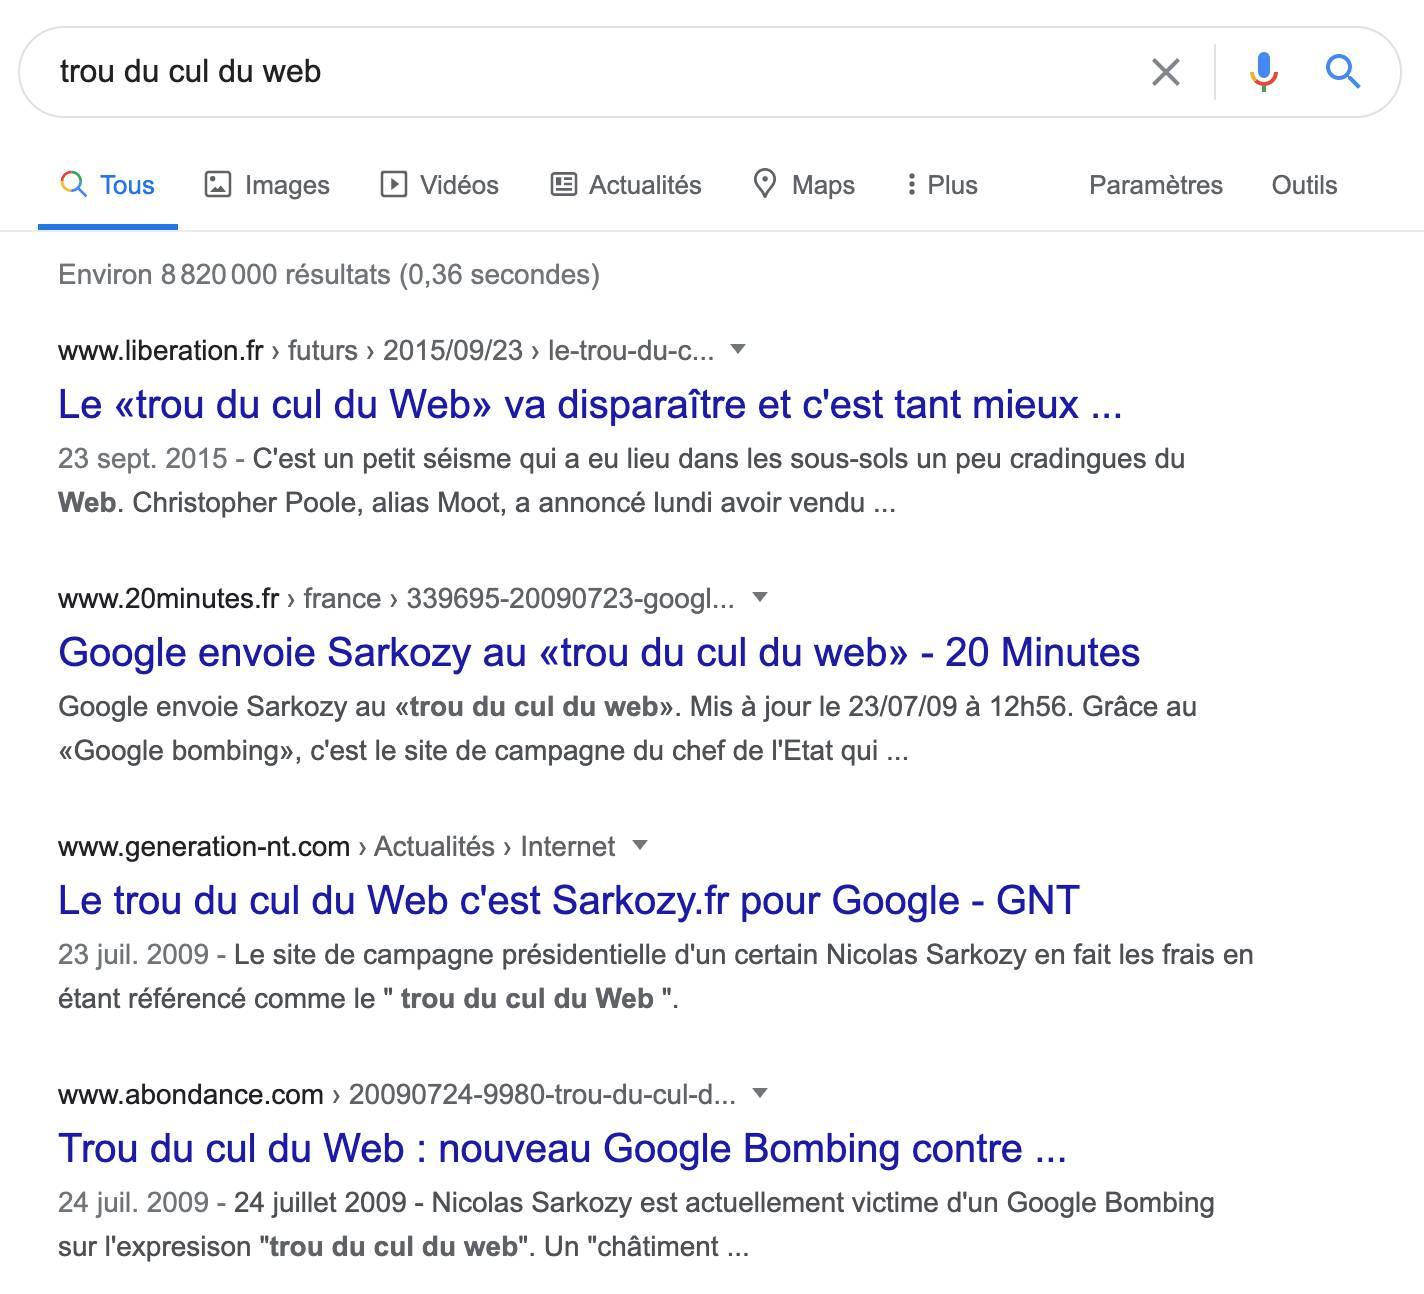 google-bombing-trou-du-cul-du-web